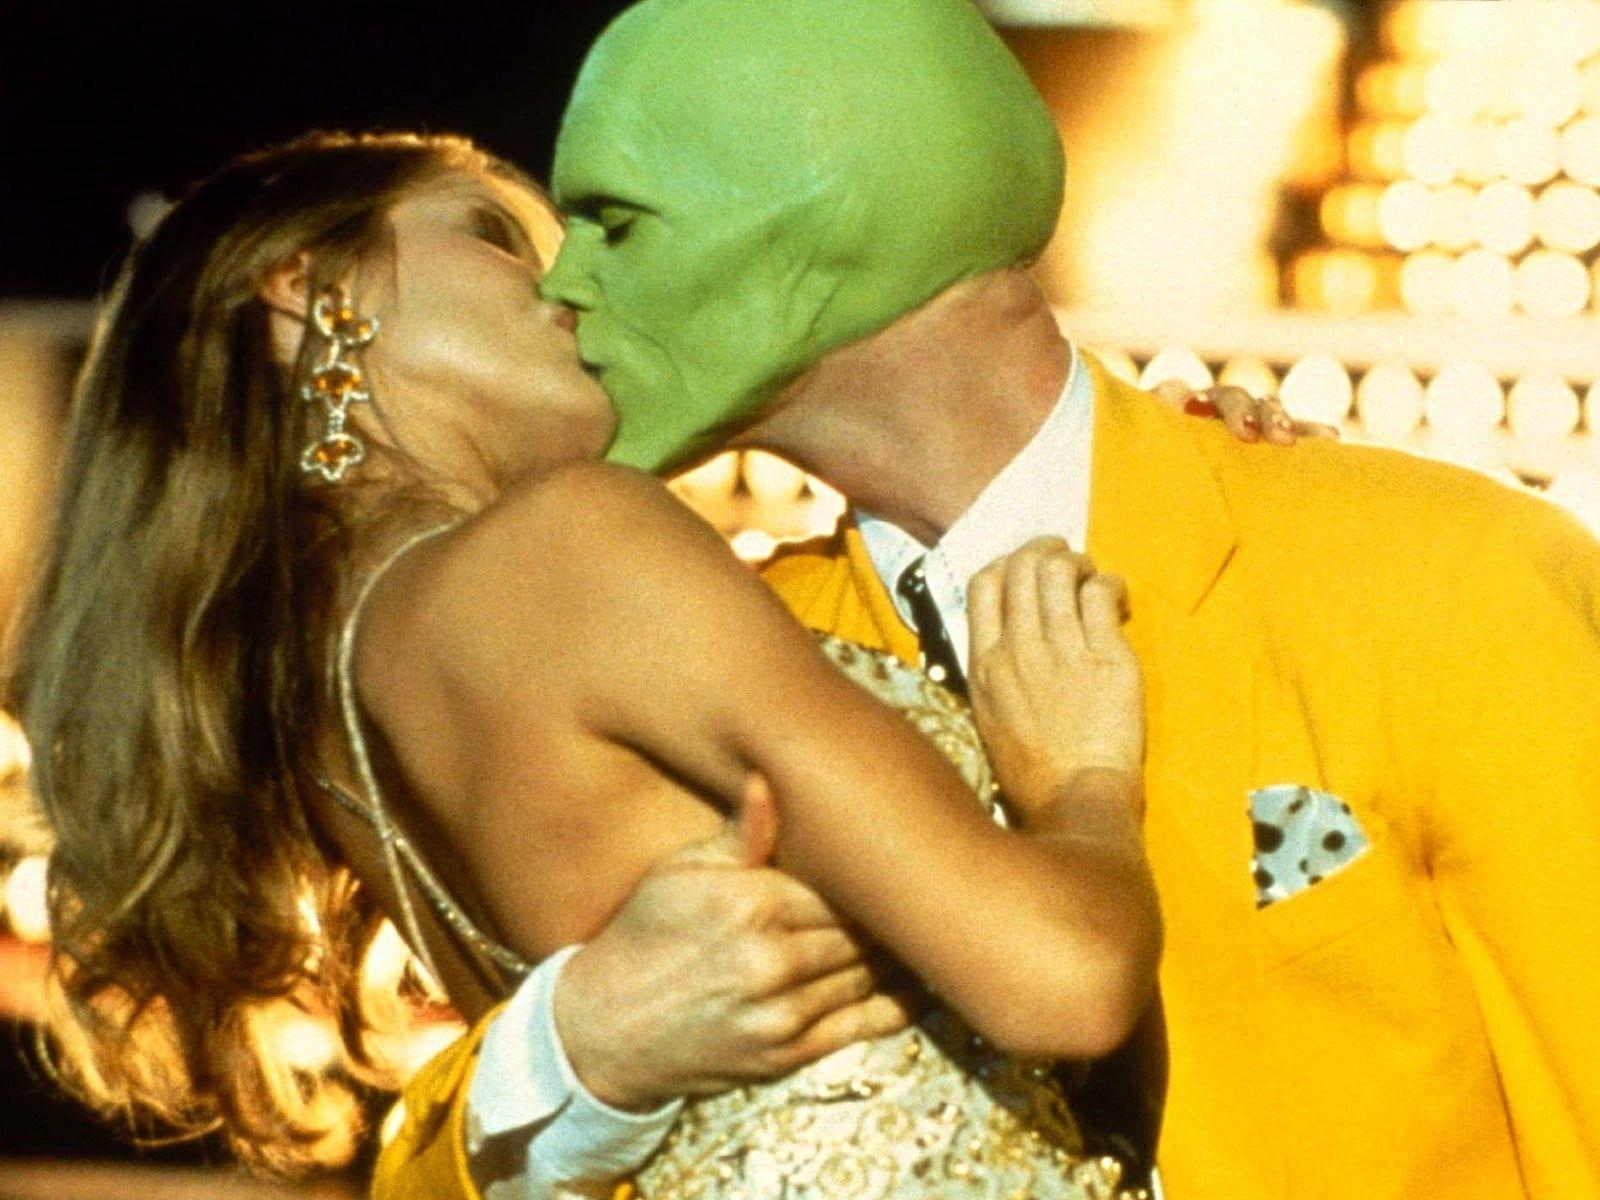 The Mask Movie Still Mask Jim Carrey Cameron Diaz Tina Carlyle Green Yellow Costume Kiss 720p Wallpaper H Movie Kisses Jim Carrey Cameron Diaz The Mask